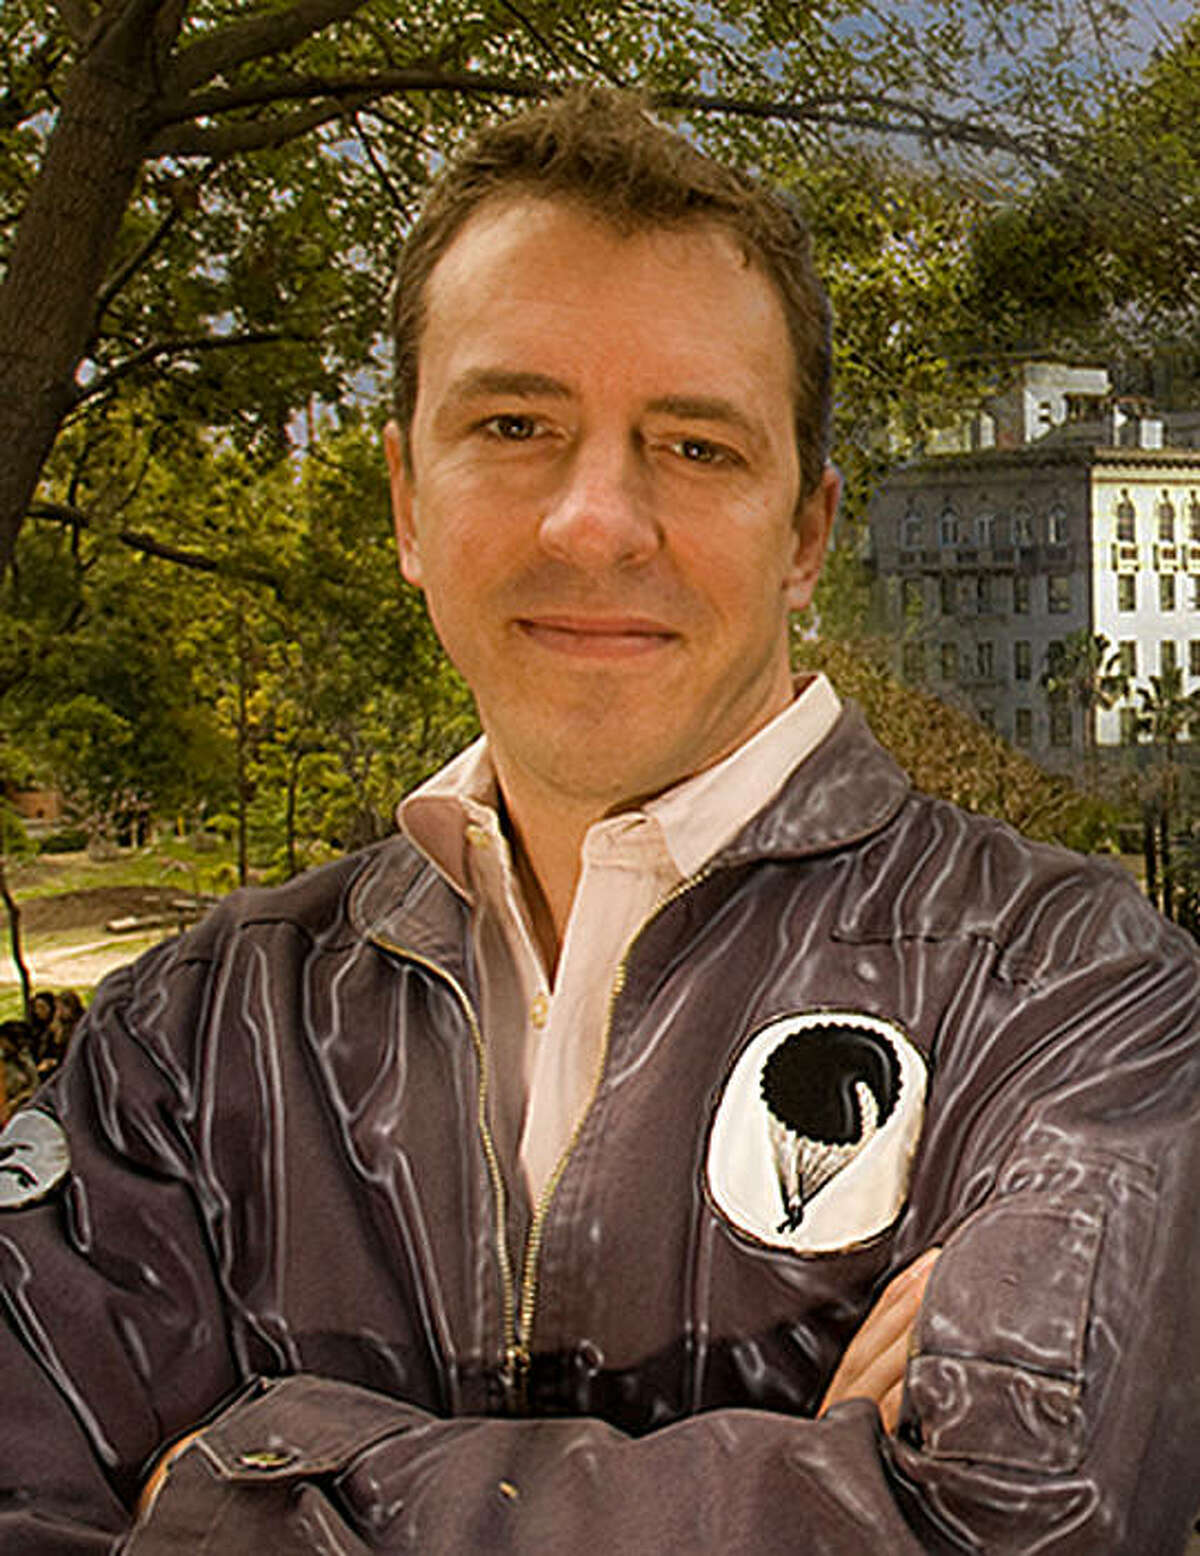 Colin Beavan, author of